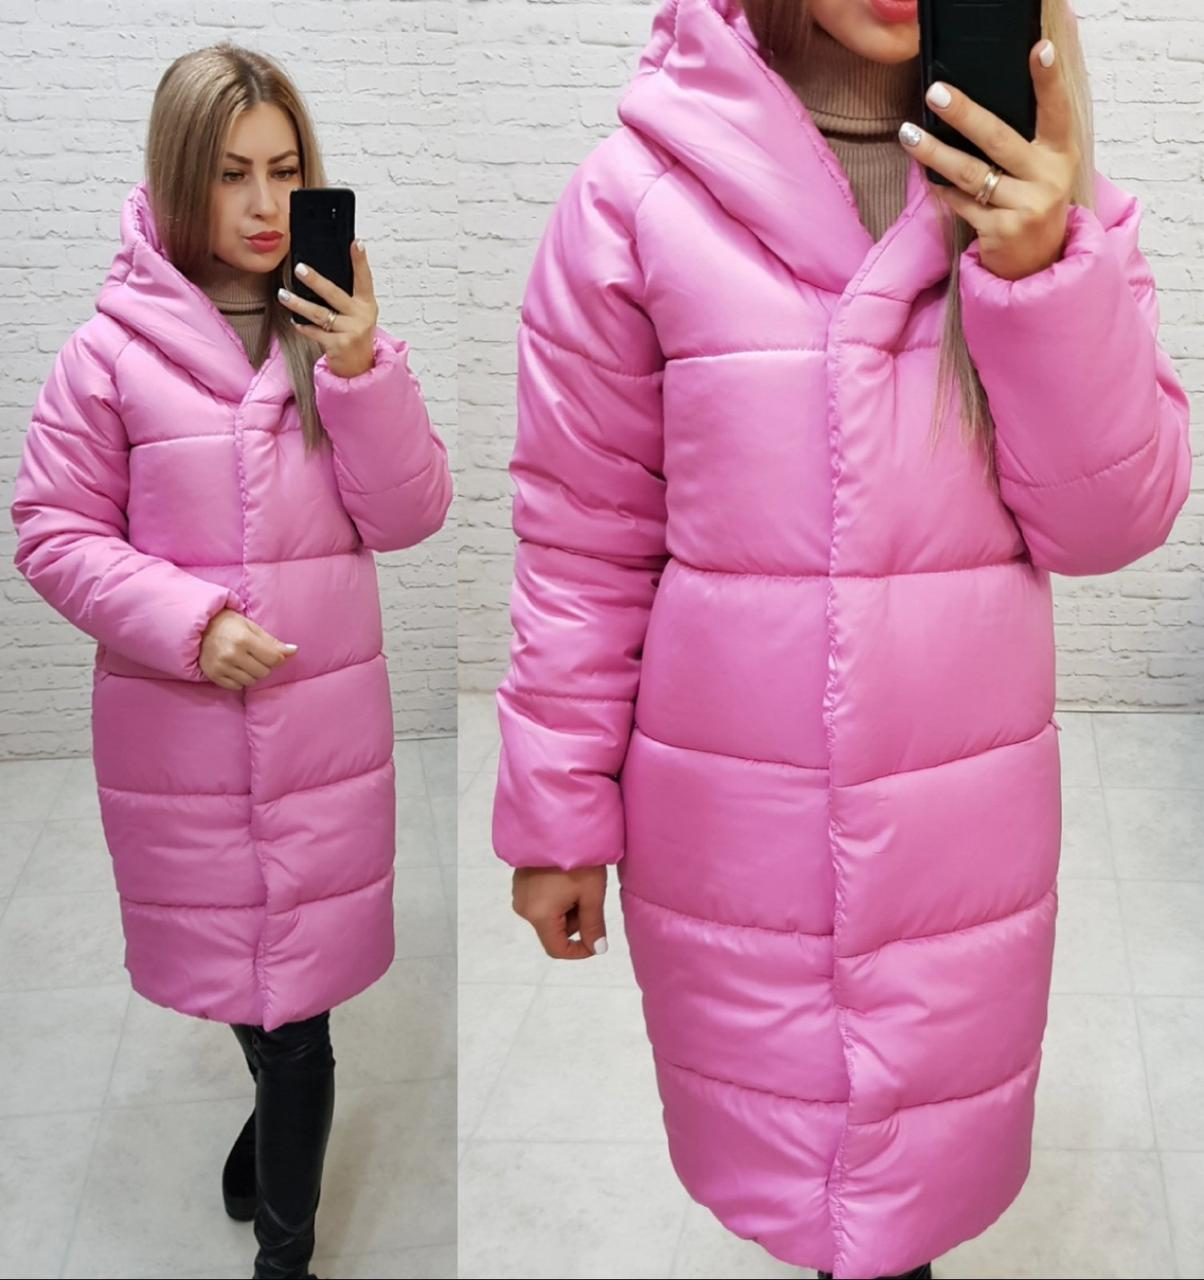 НОВИНКА! Куртка  Oversize зимняя, артикул 530, цвет ультра розовый